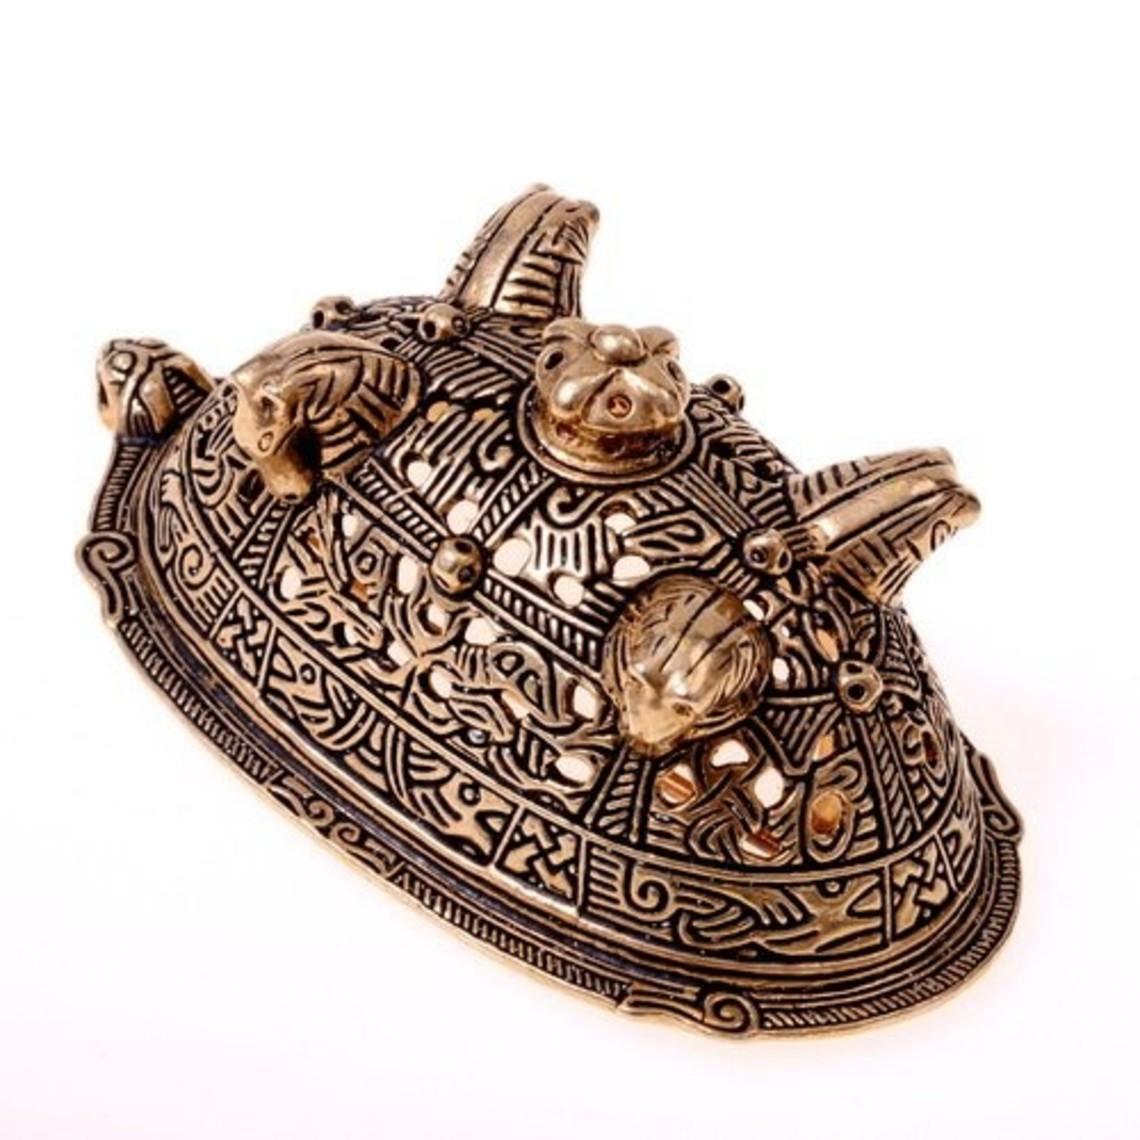 Viking tartaruga spilla Birka, tomba 860